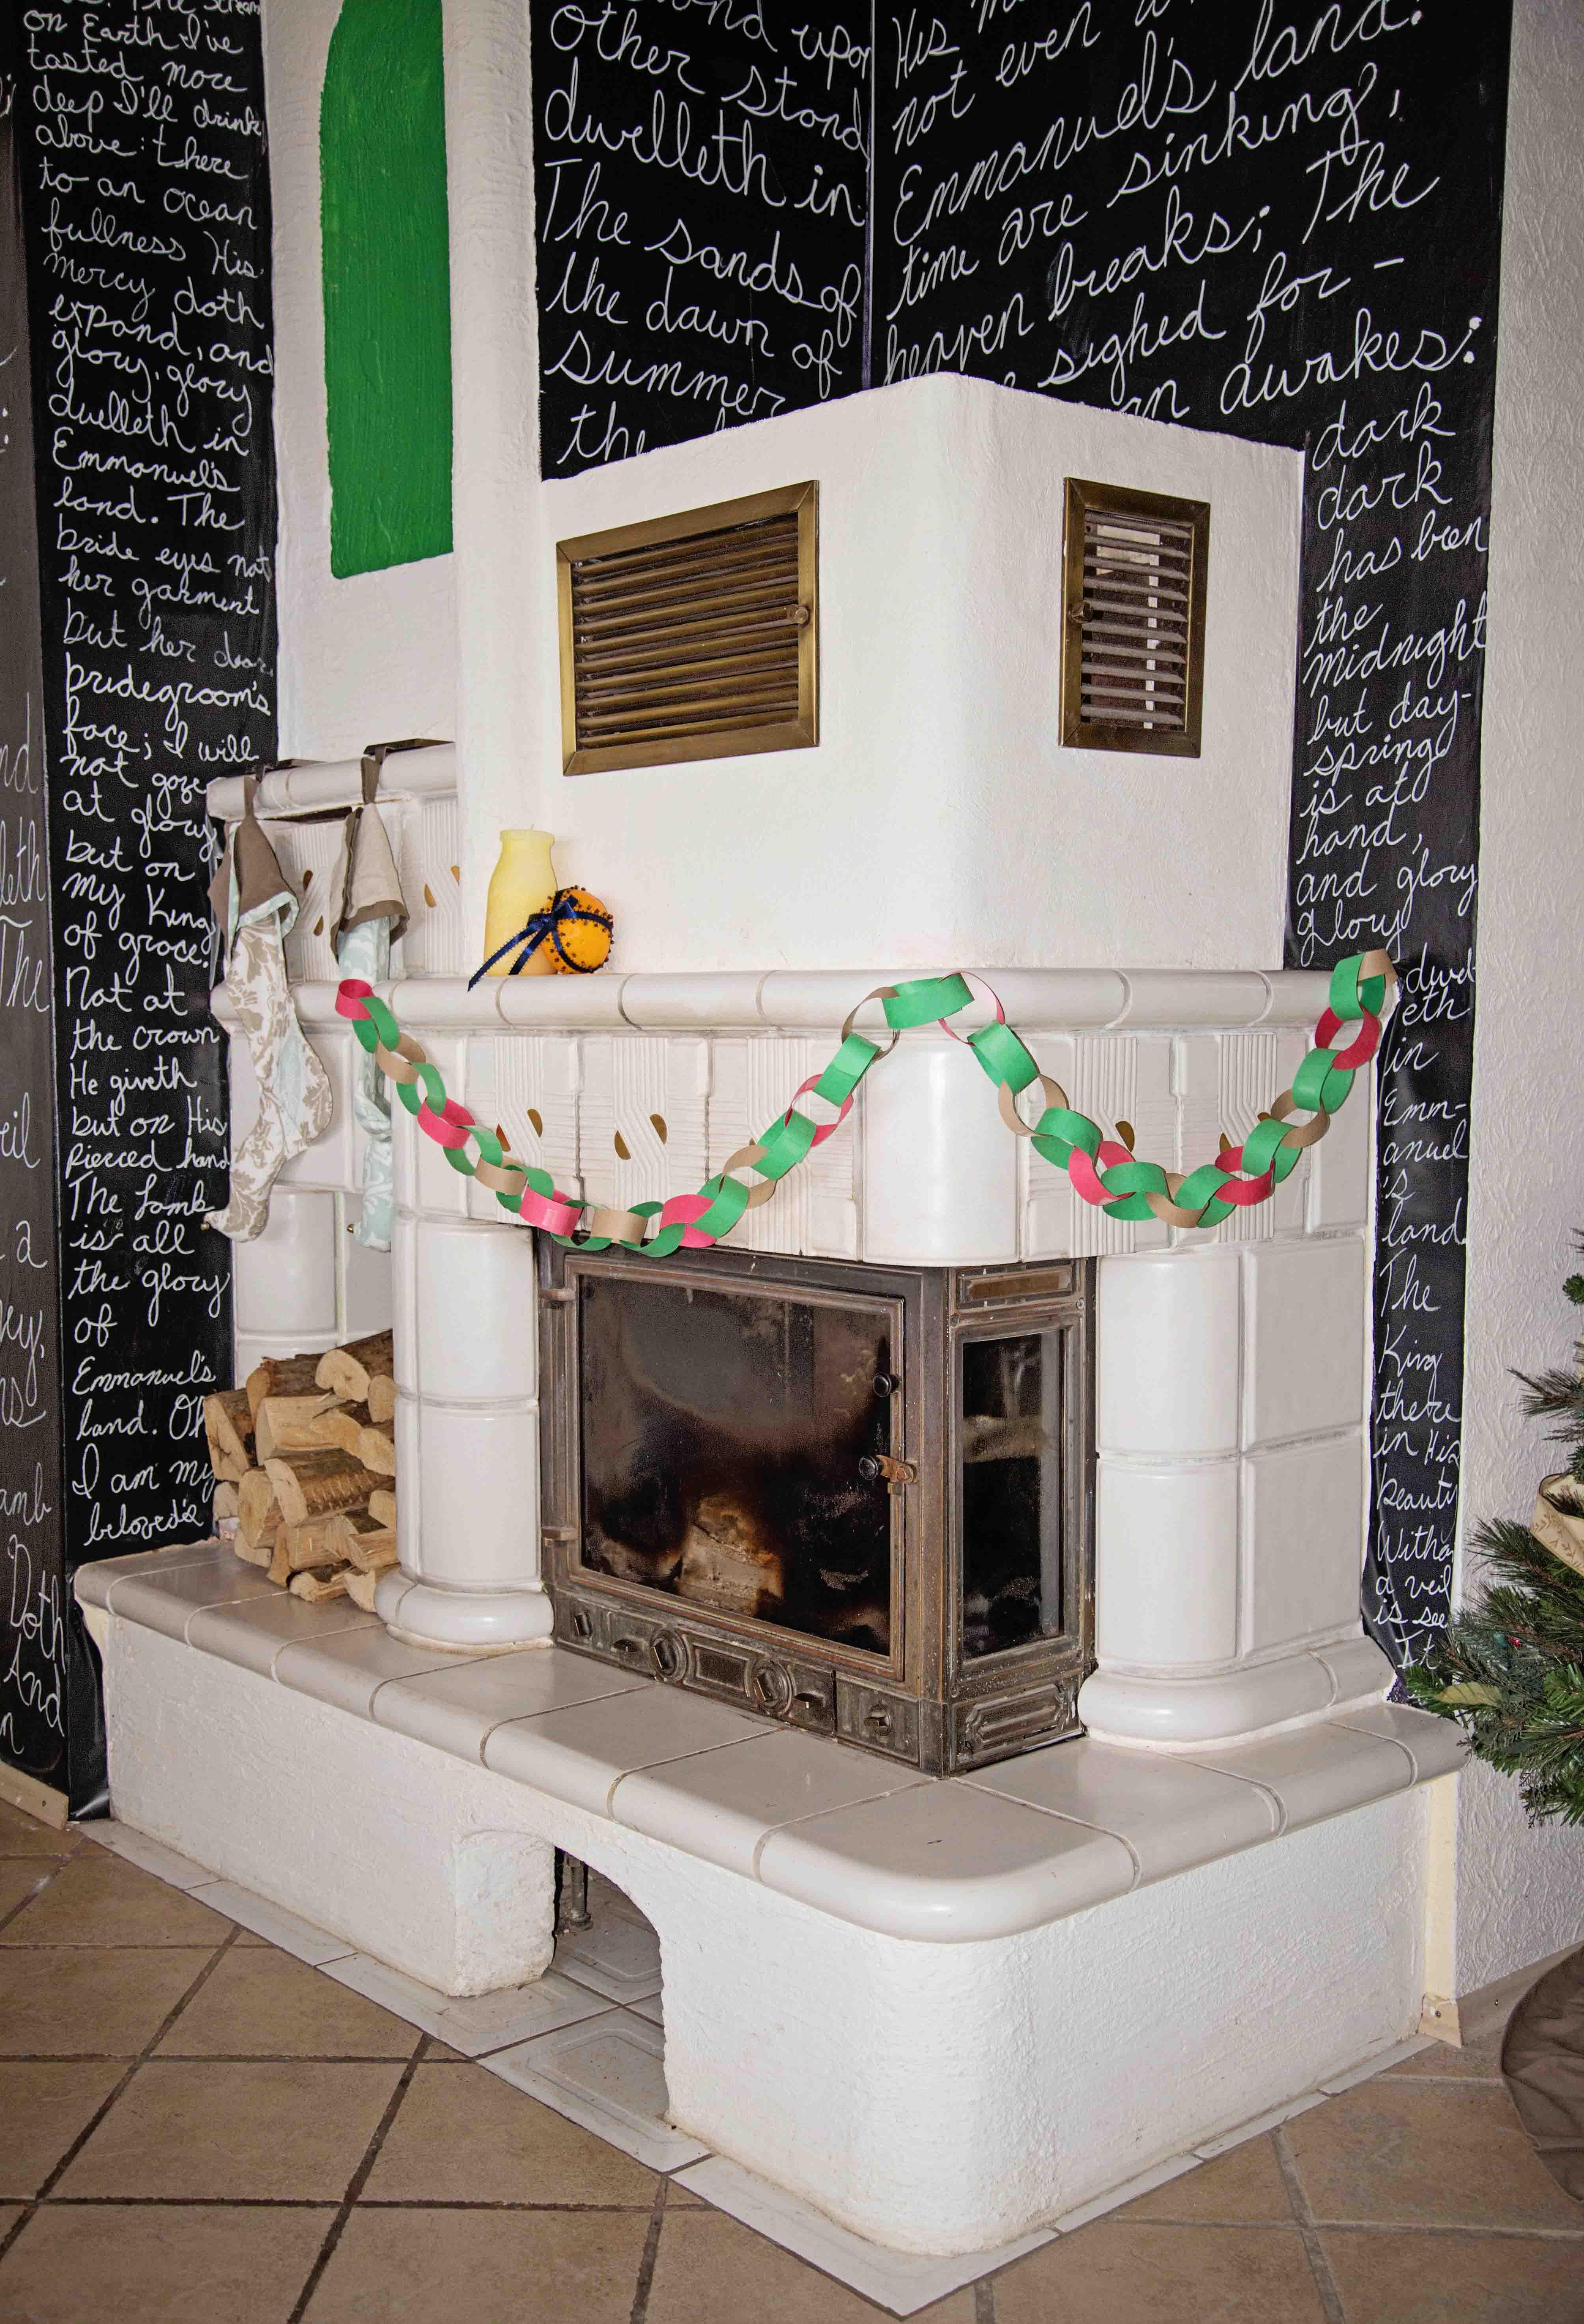 8 Classy, Kid Made Christmas Ornaments